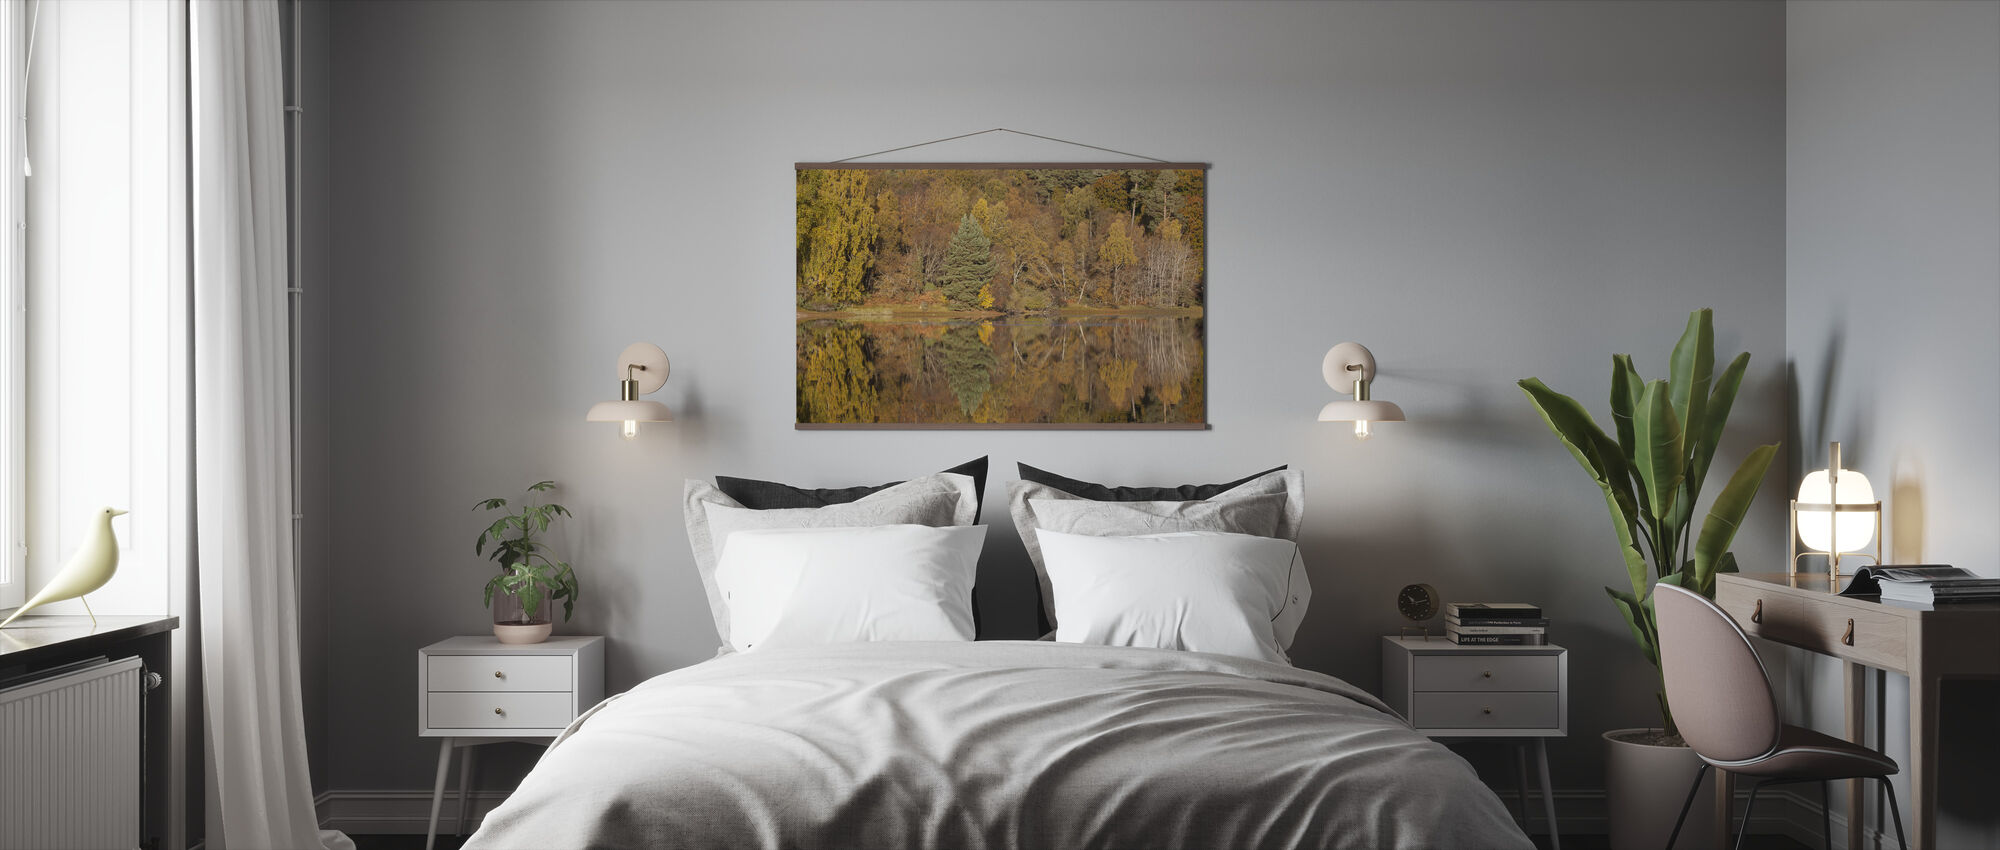 Trees Reflecting in Loch Vaa, Highlands, Scotland, UK - Poster - Bedroom